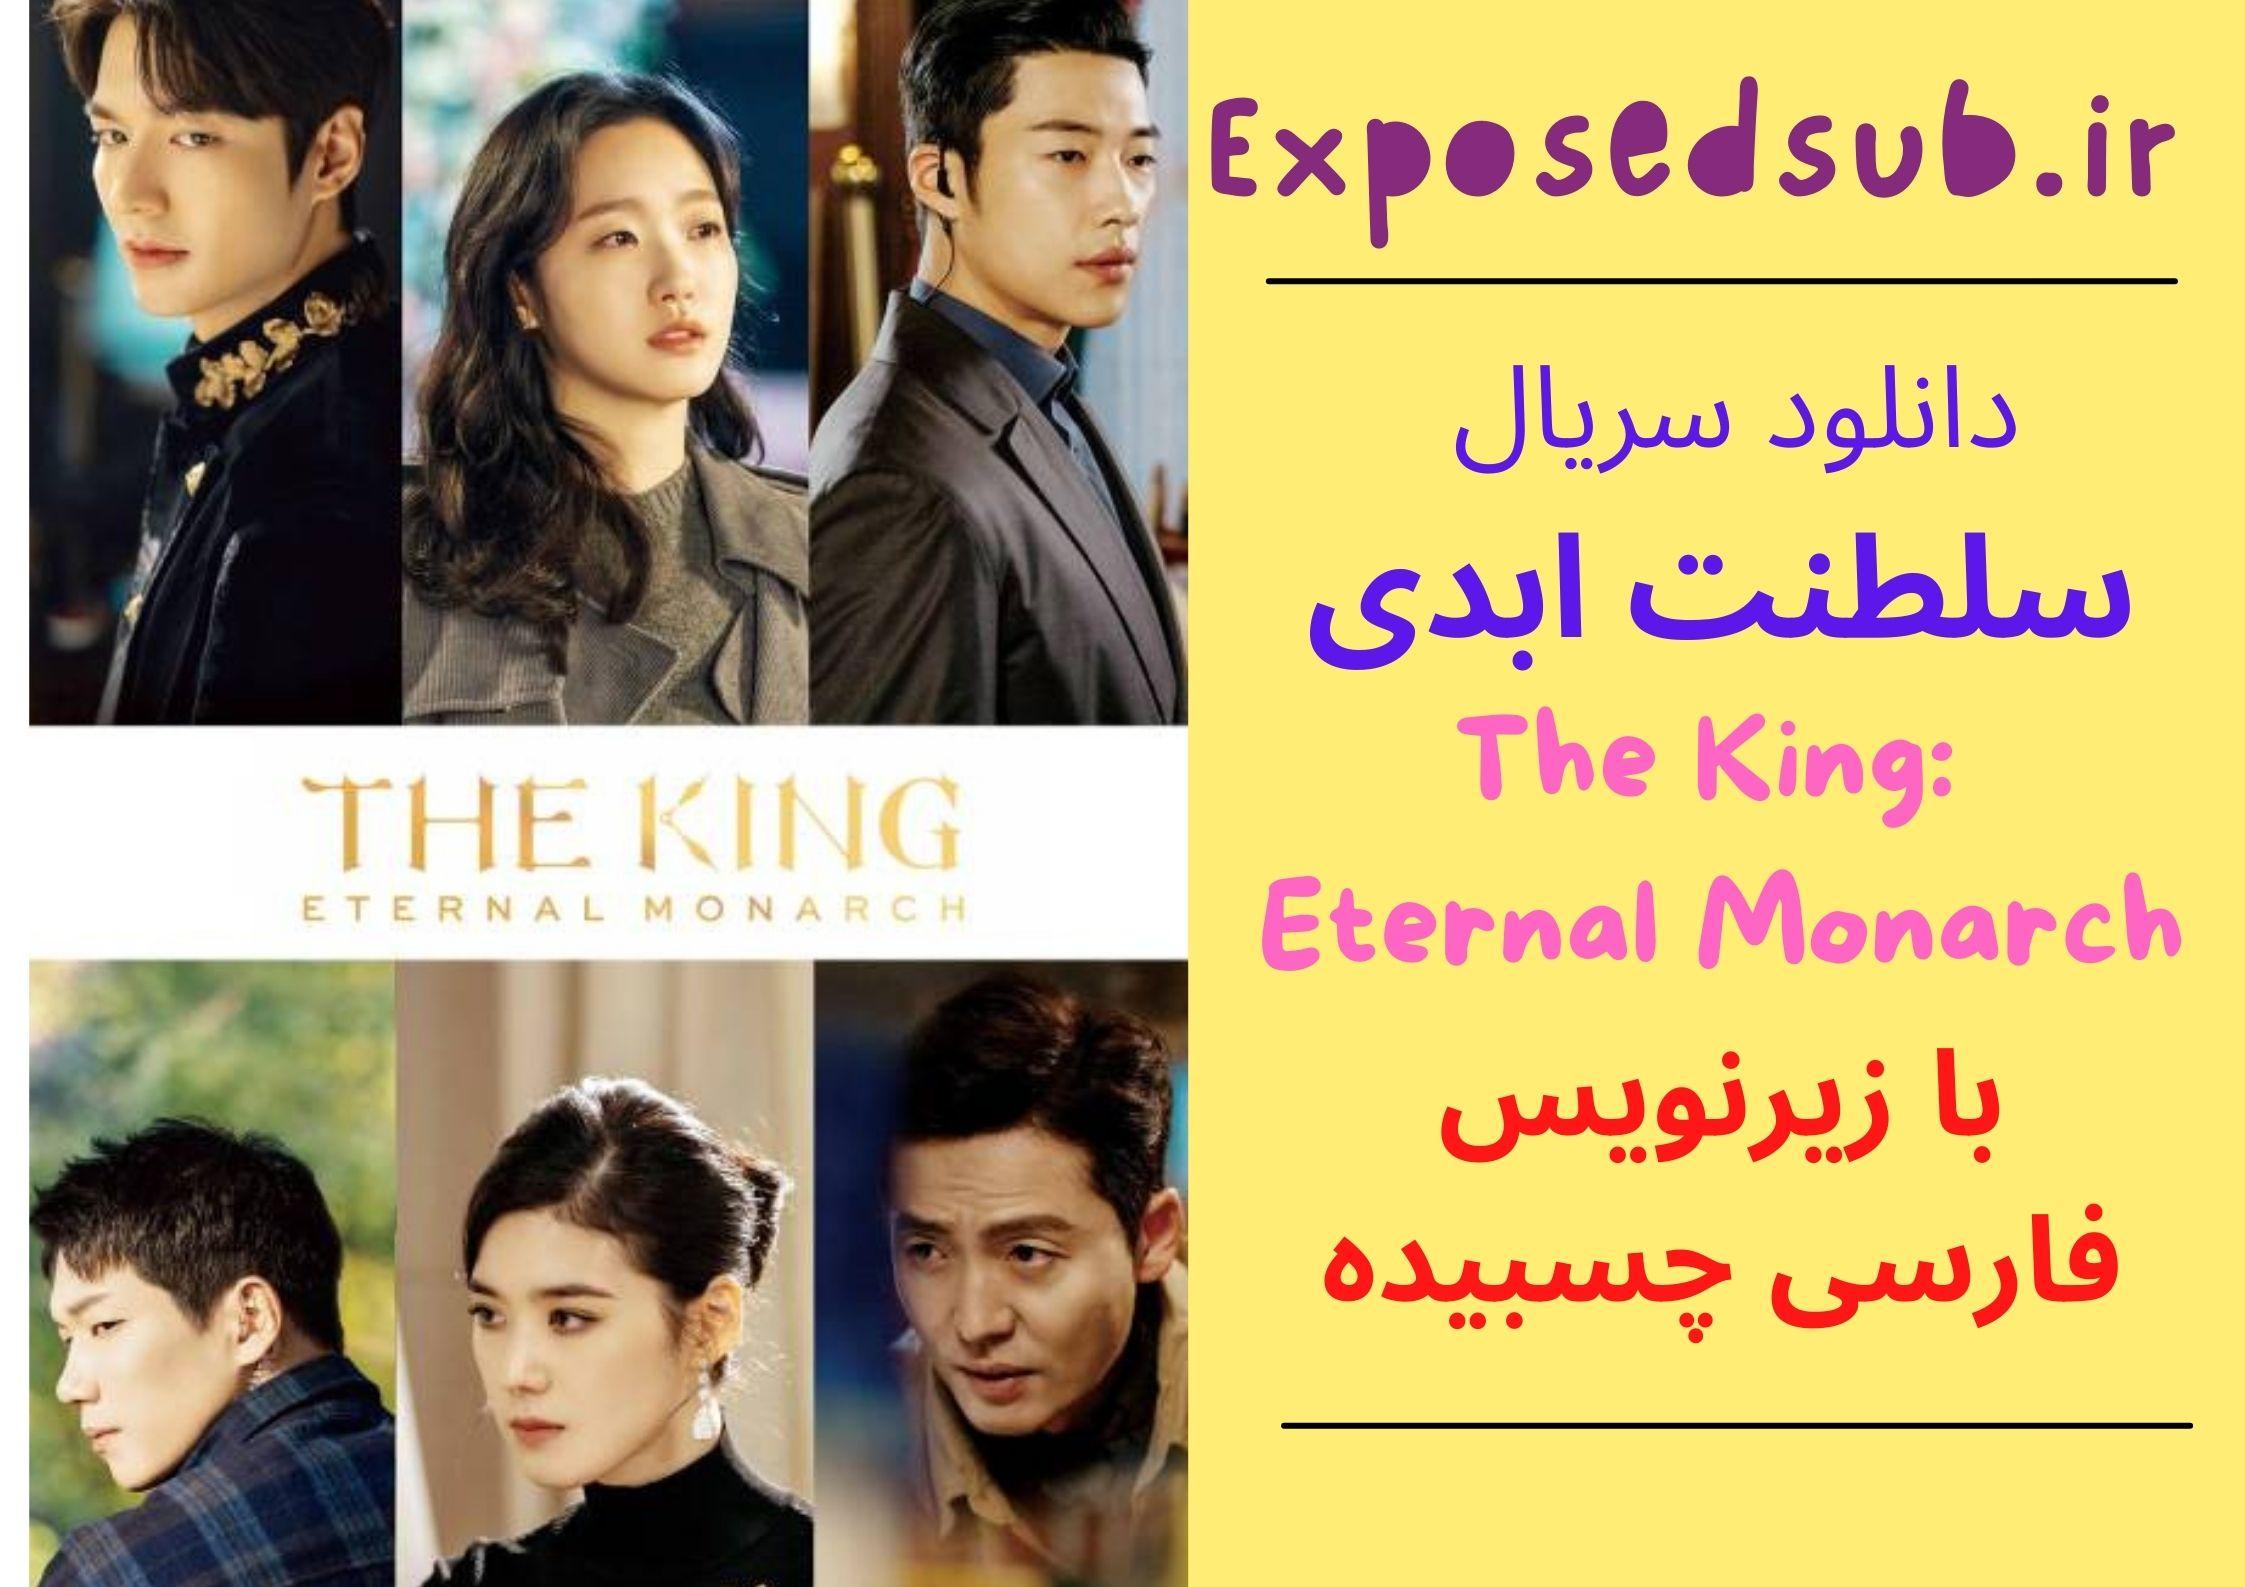 http://exposedsub.ir/دانلود-سریال-سلطنت-ابدی-The-King:-Eternal-Monarch-با-زیرنویس-چسبیده.html